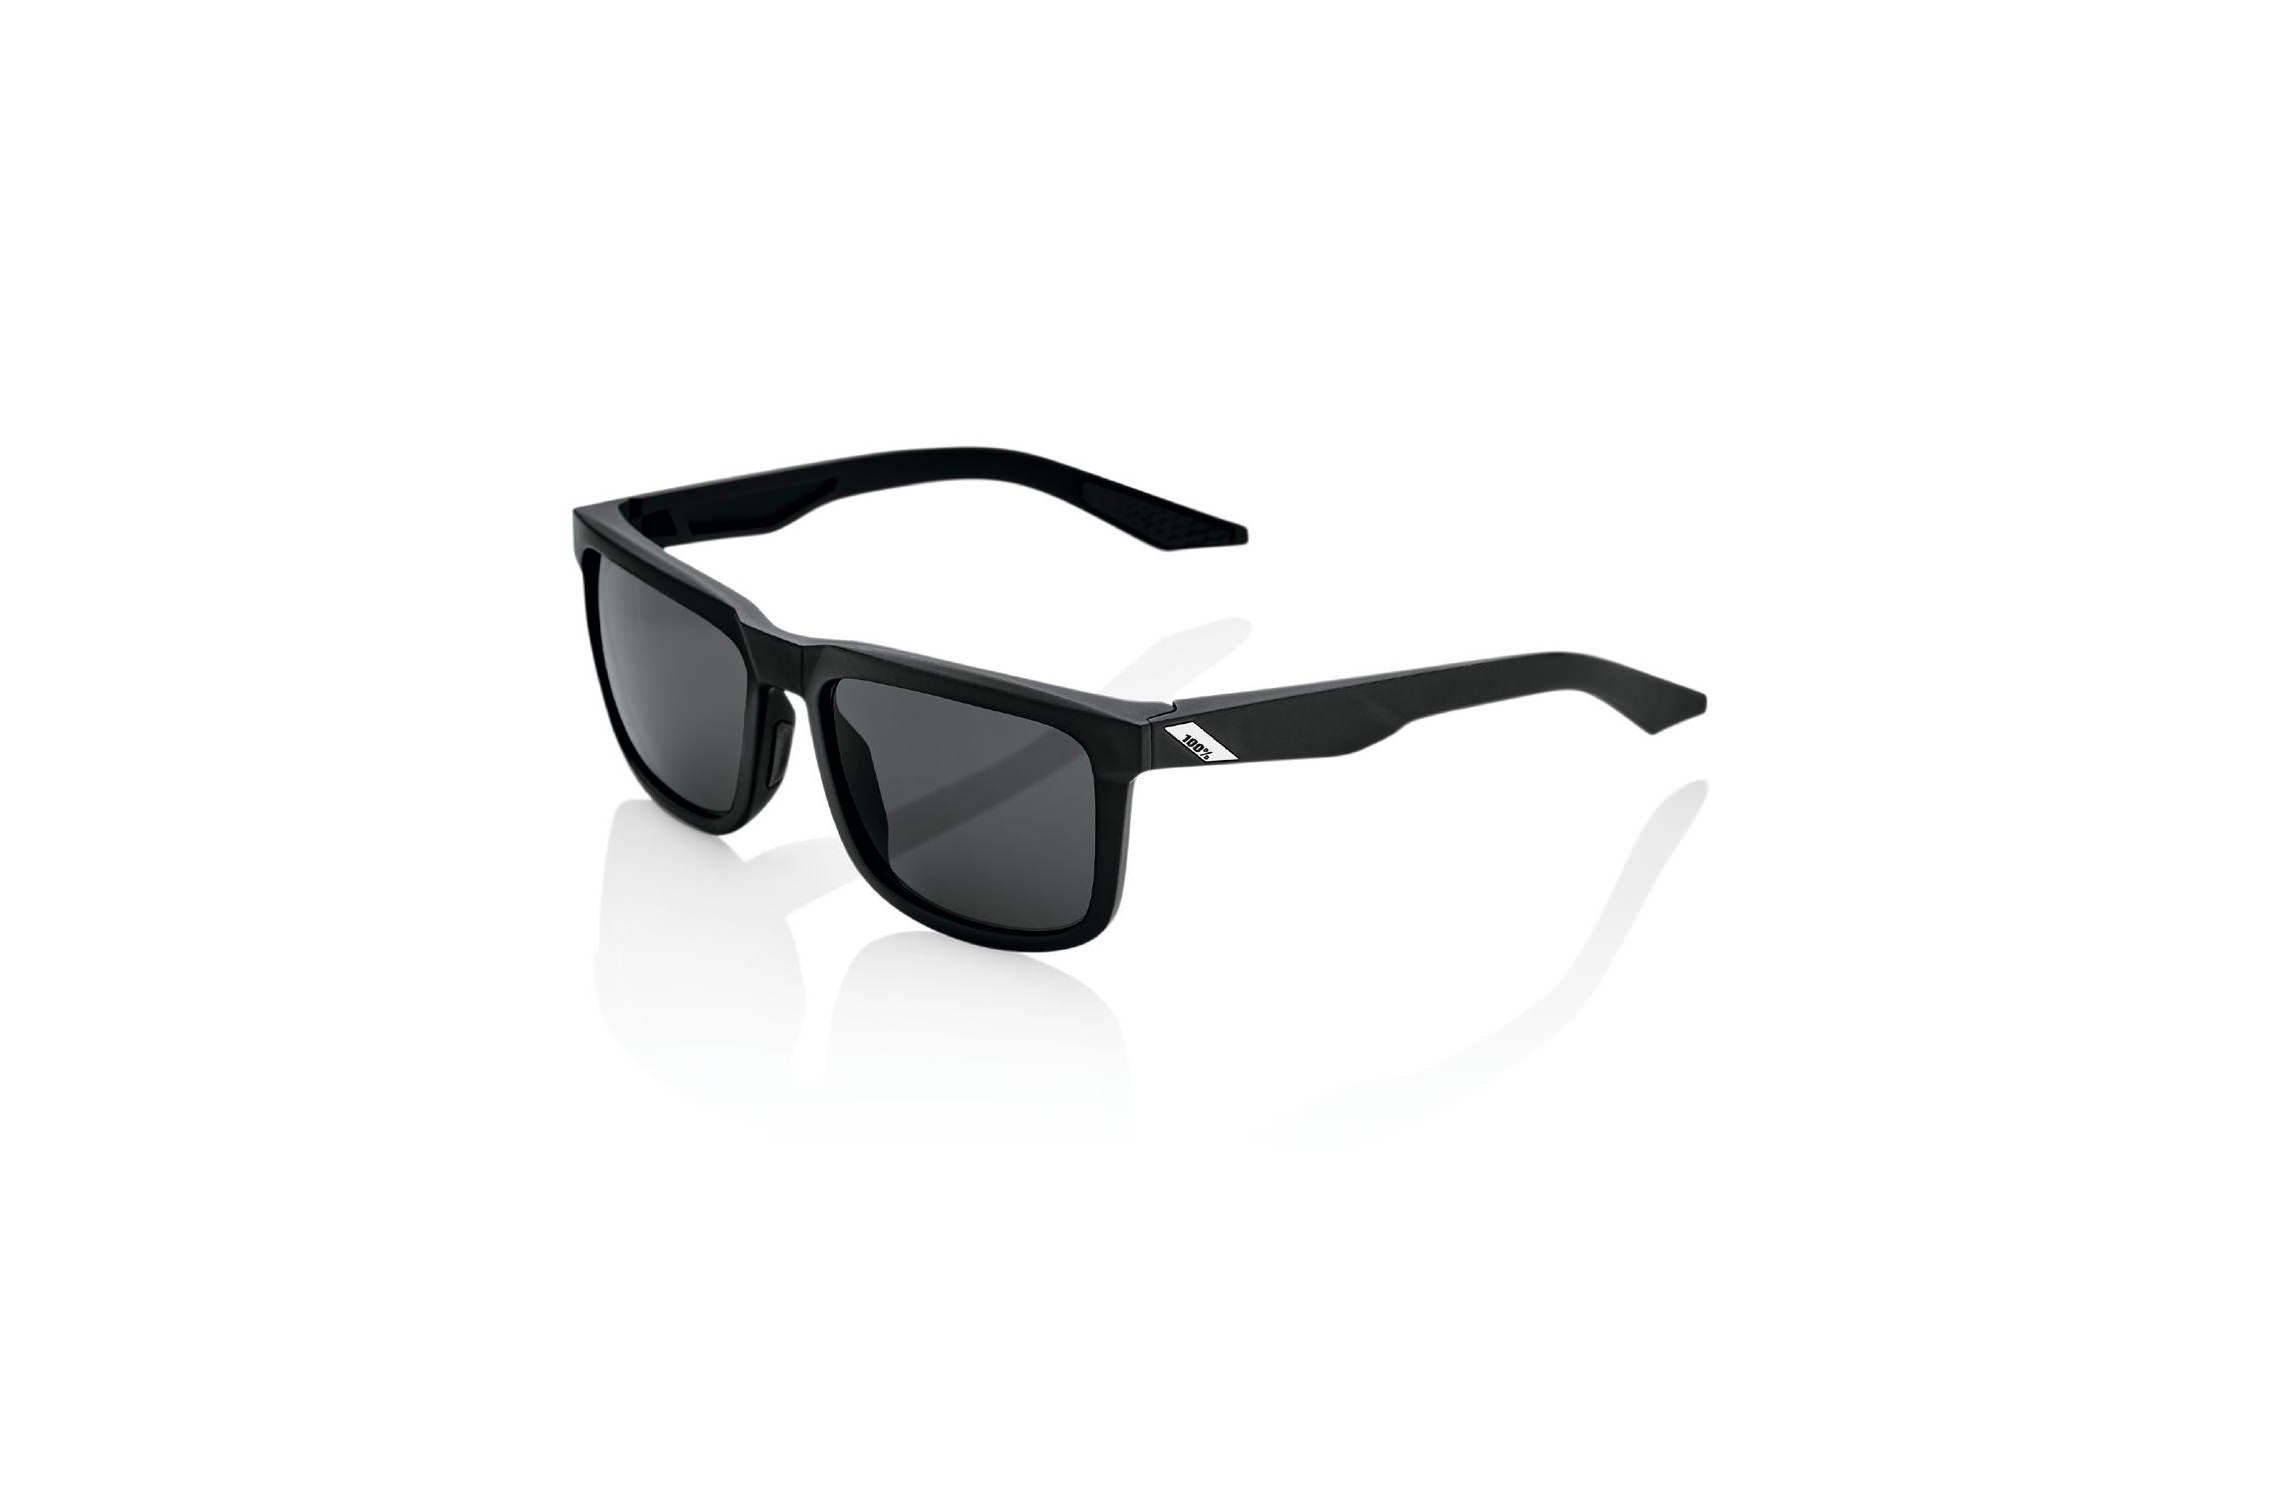 100% Blake Sunglasses - Impact-Resistant Motorcycle Eyewear